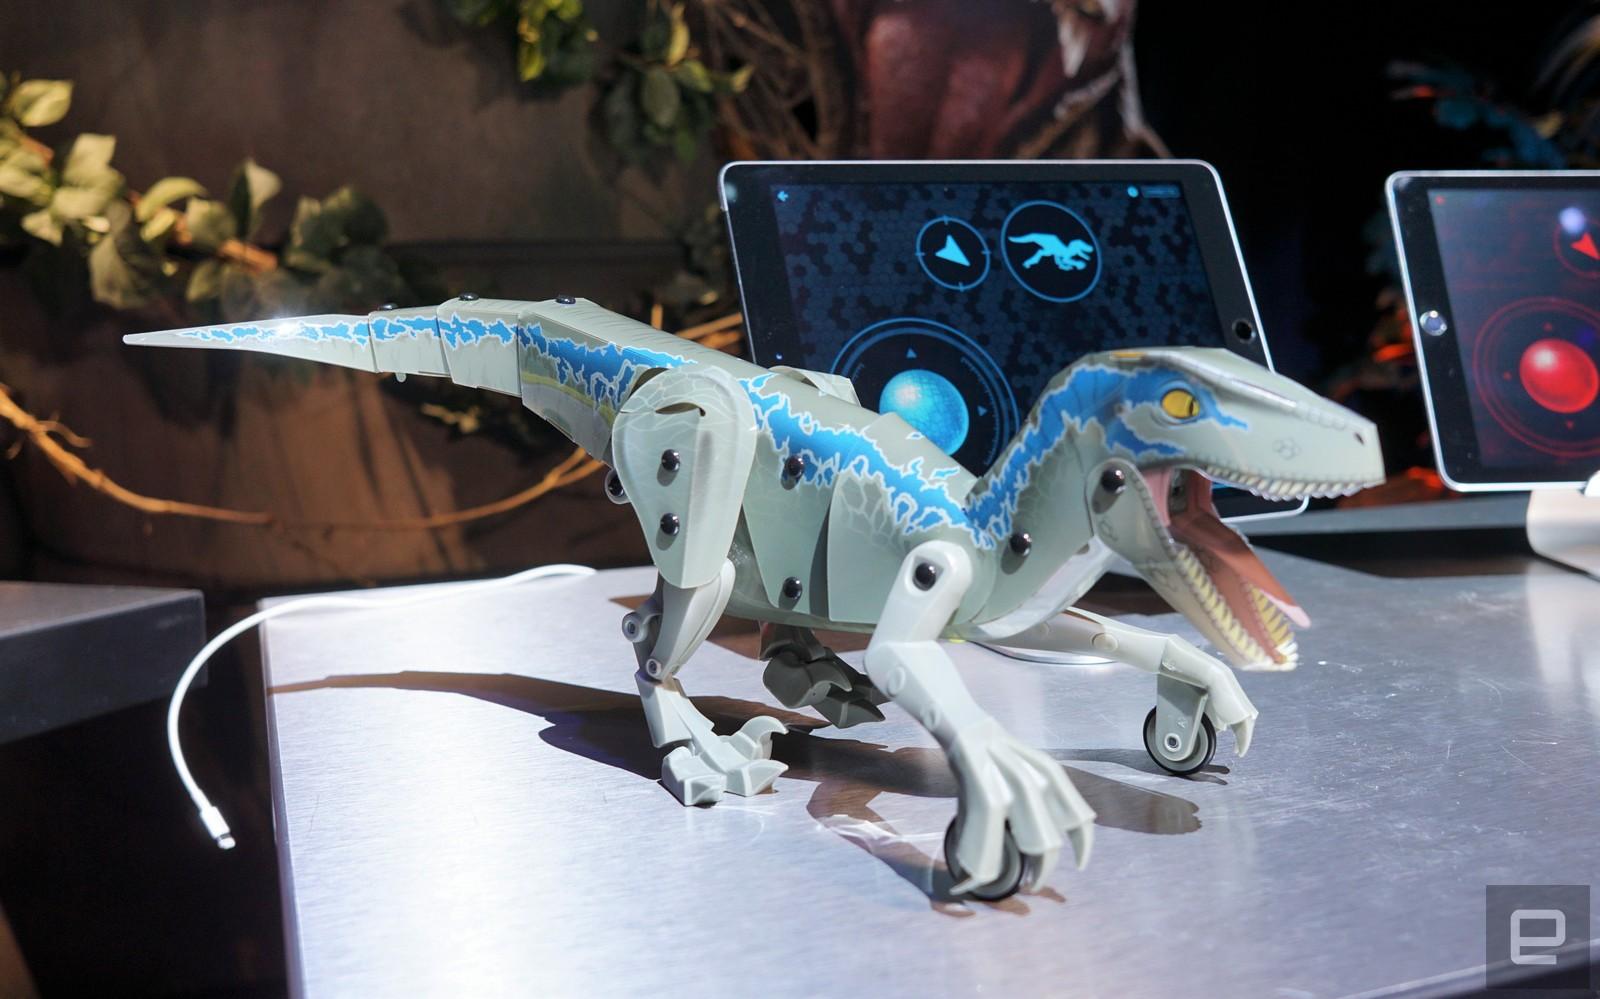 Jurassic+World+bots+gallery+3.jpg